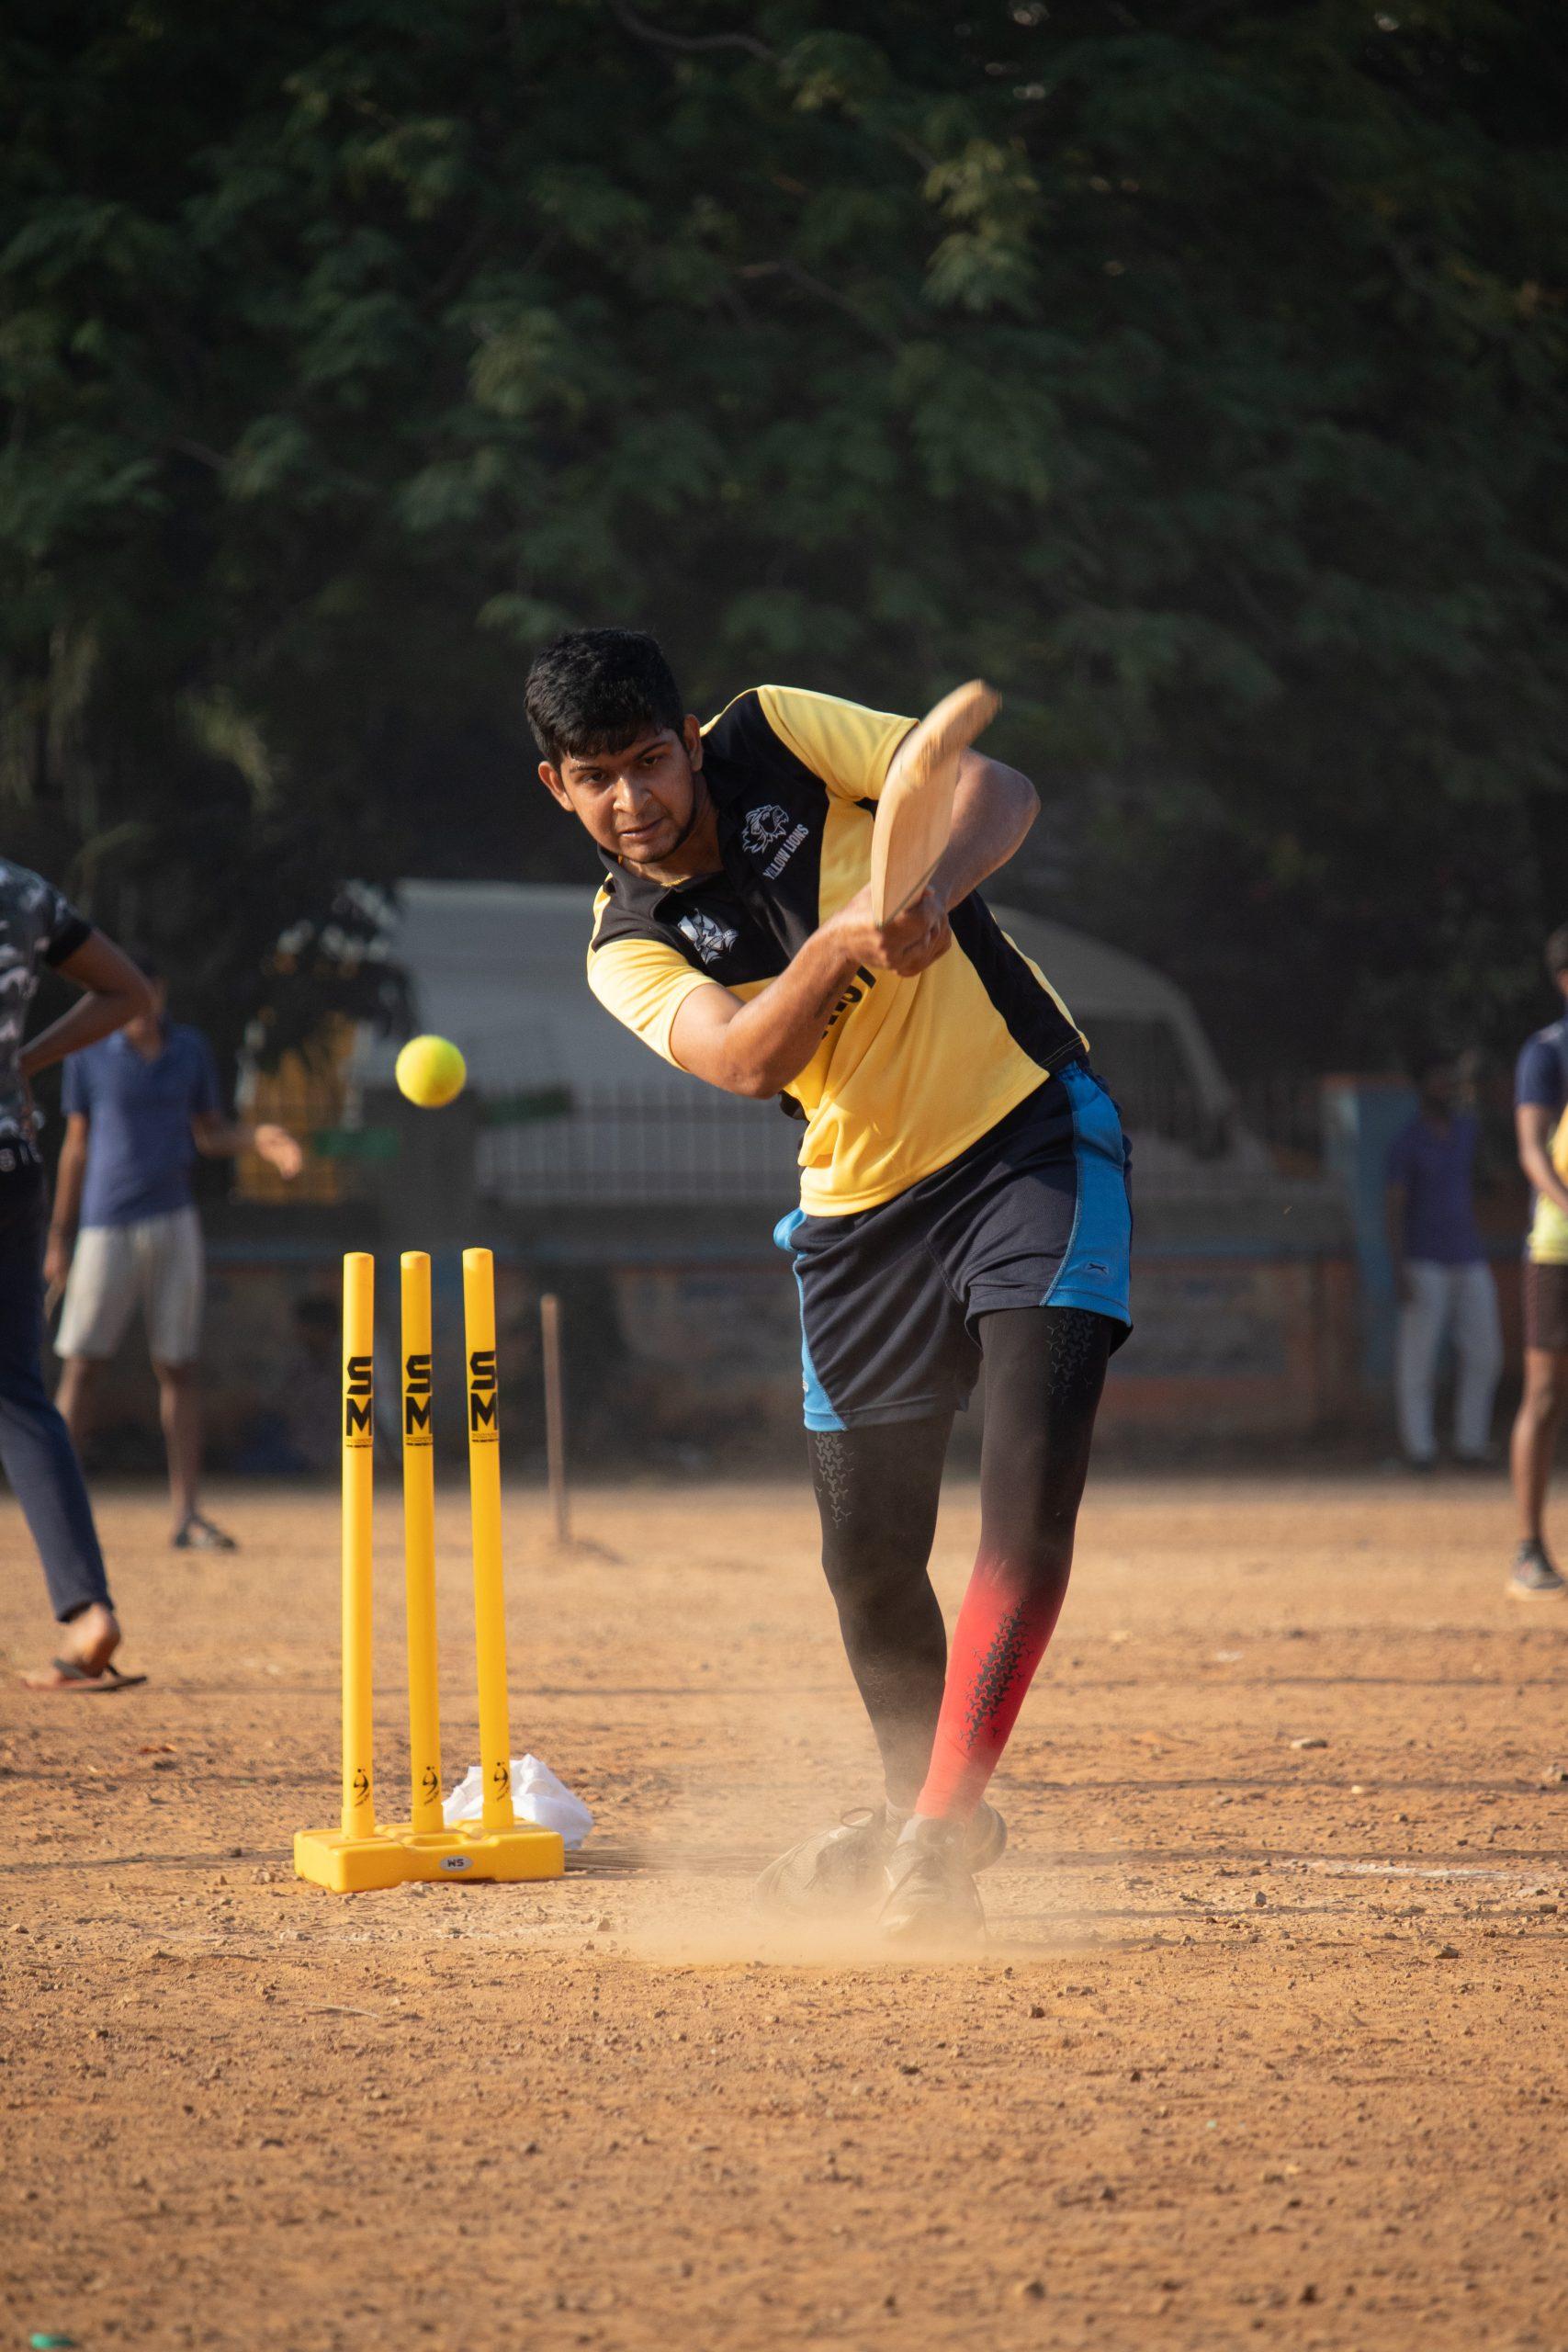 Batsman smashes a stunning shot